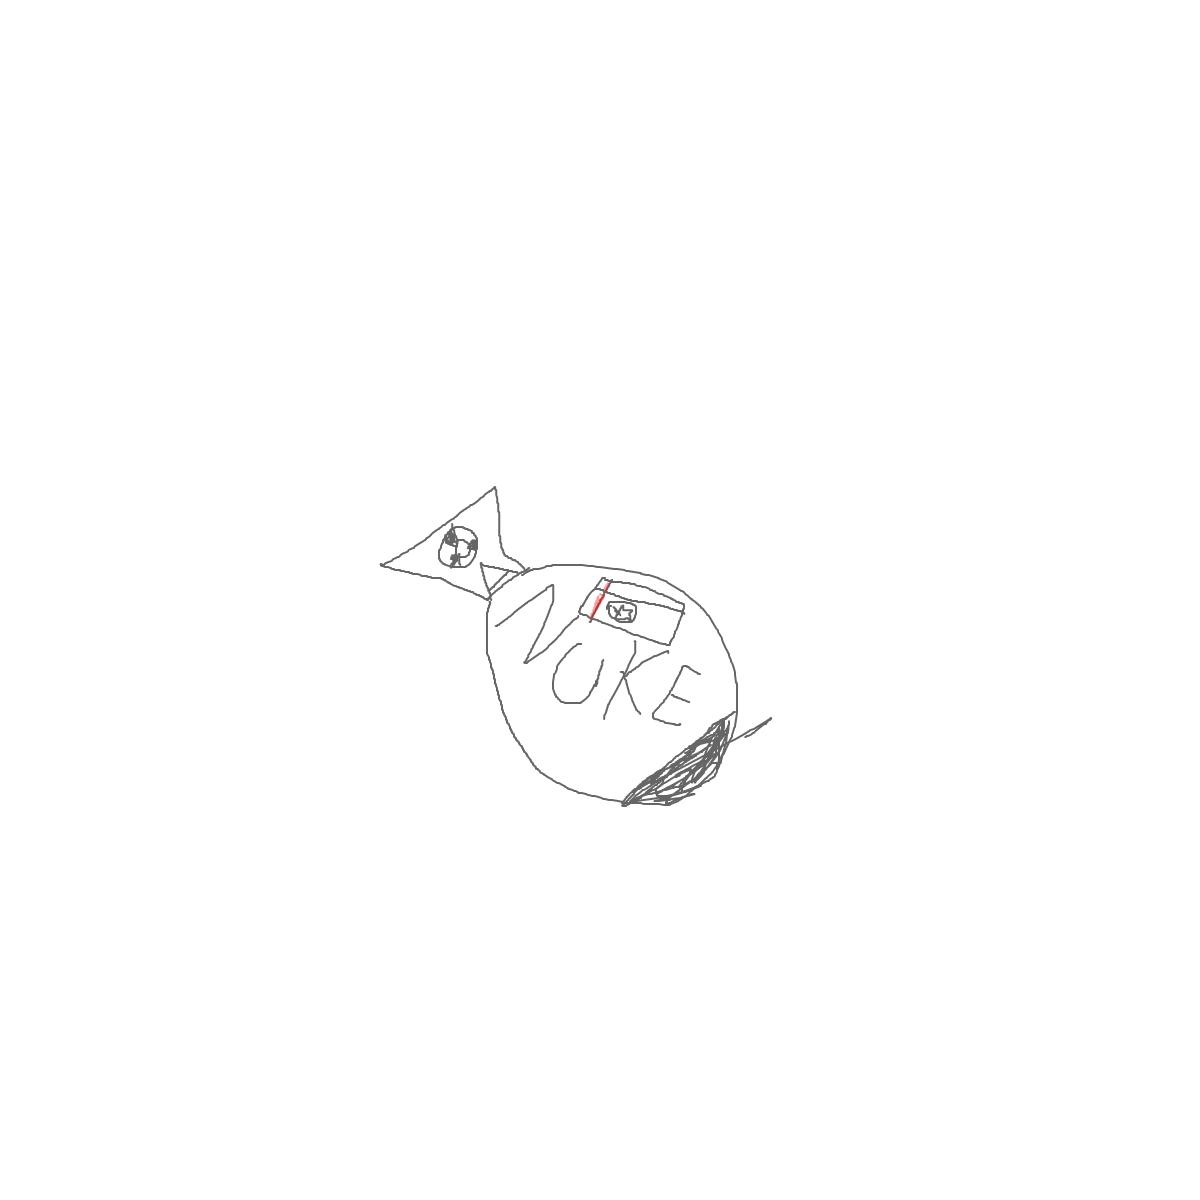 BAAAM drawing#23337 lat:53.4129791259765600lng: -2.9886922836303710